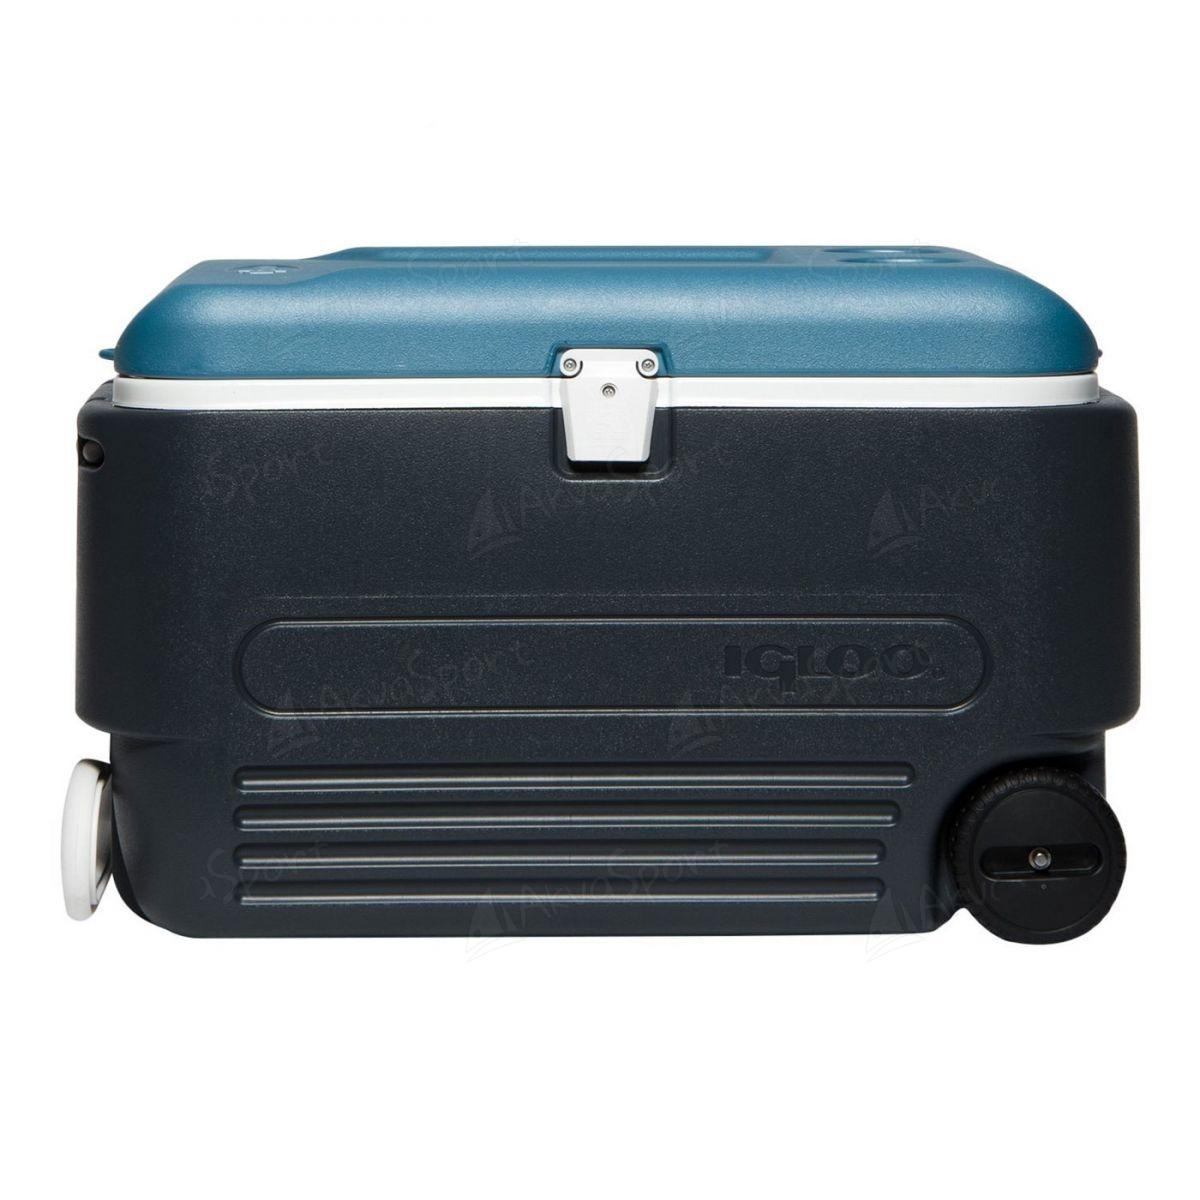 3ed662f62a7 Cooler Igloo MaxCold 60 Roller - Jet | AkvaSport.com